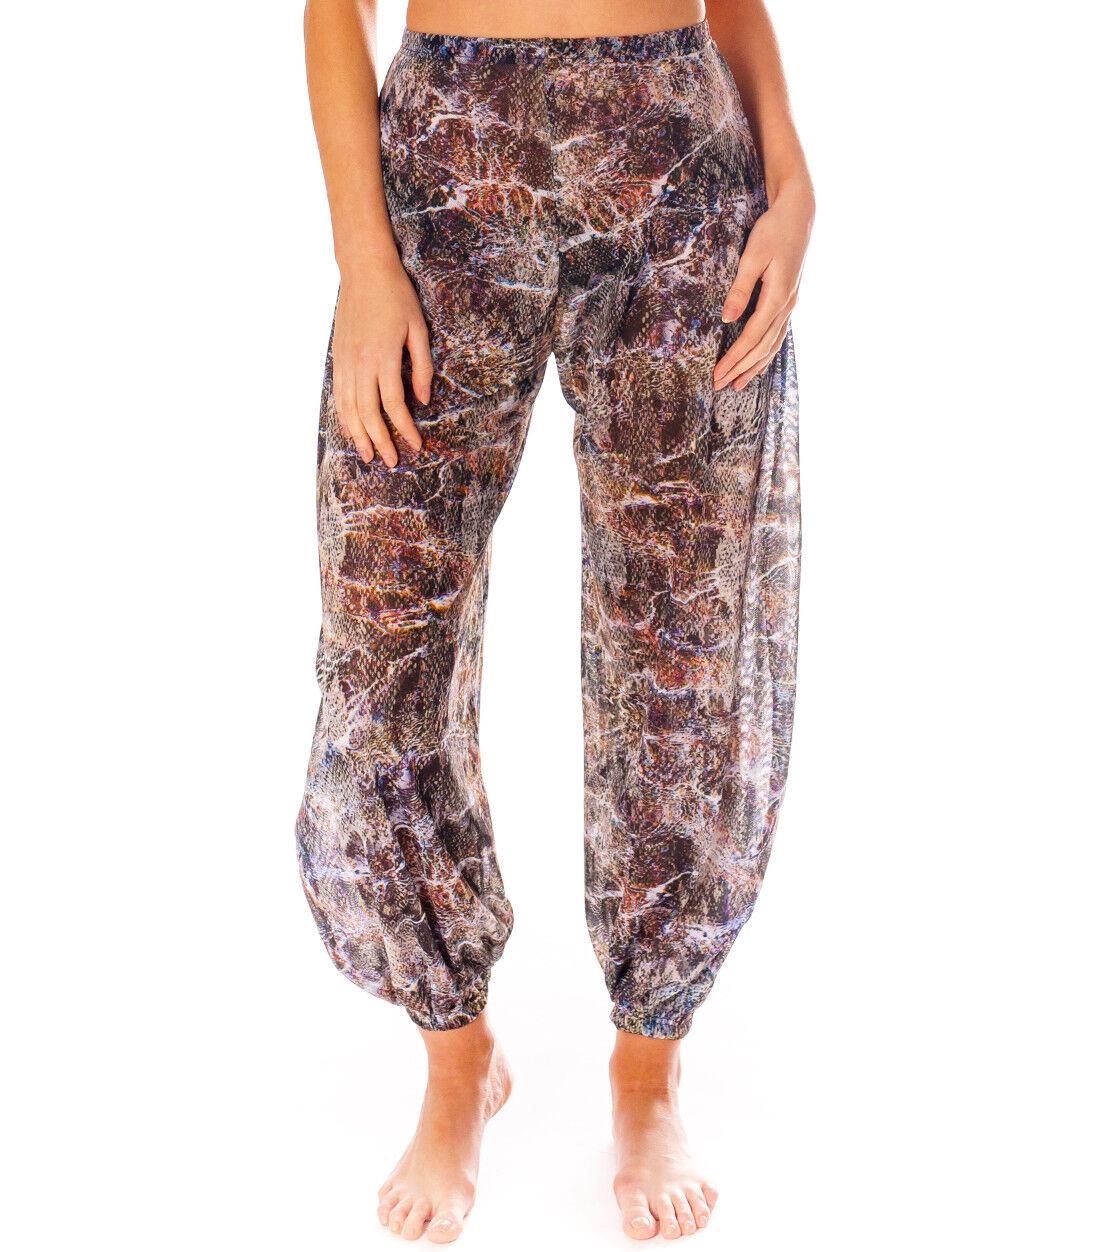 Kiniki BALI tan through Harem Pantaloni Accessorio beachwear made in England